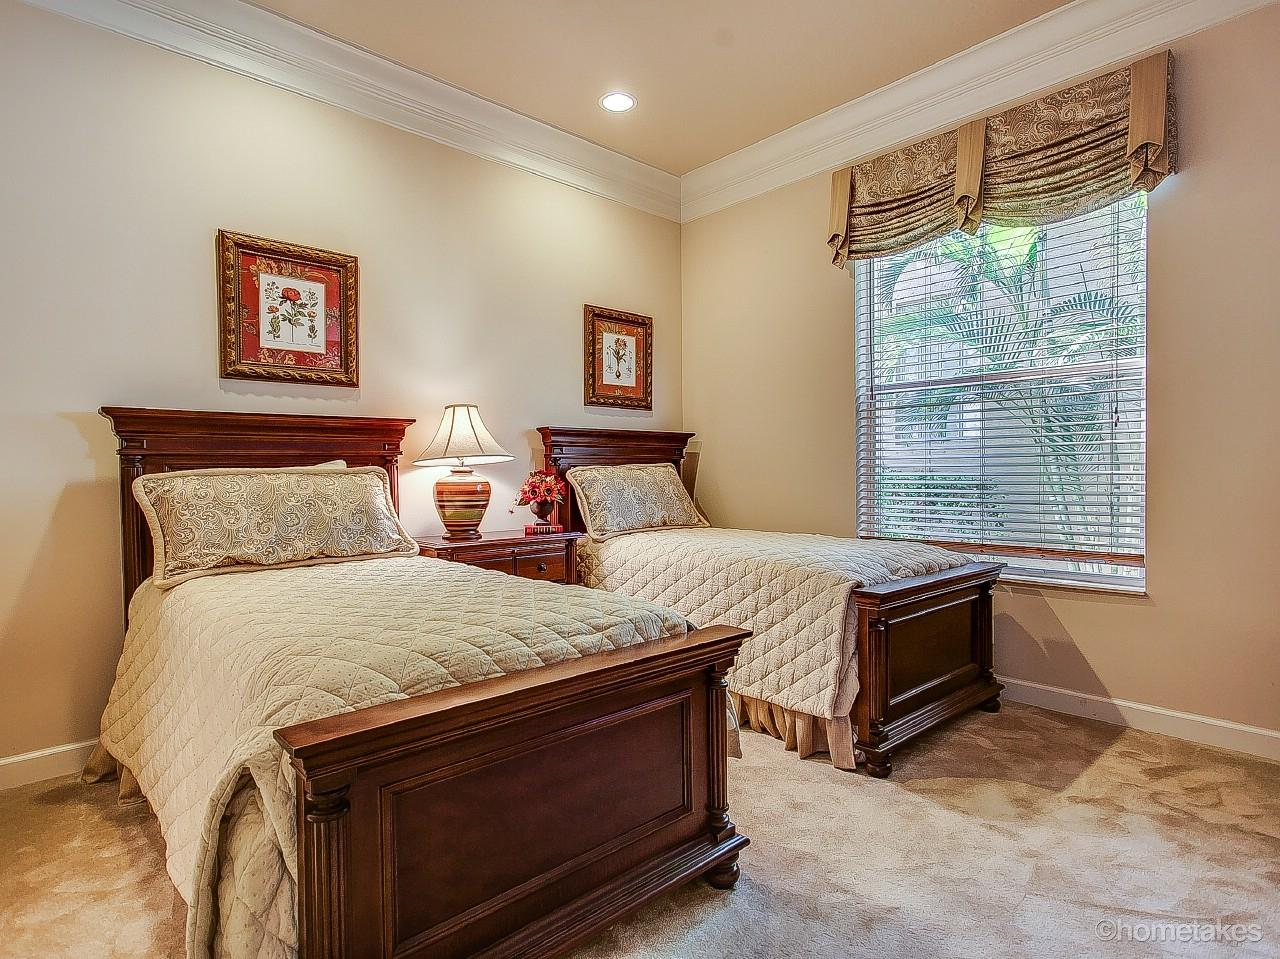 116 Bianca Drive, Palm Beach Gardens, Florida 33418, 3 Bedrooms Bedrooms, ,3.1 BathroomsBathrooms,F,Single family,Bianca,RX-10676951